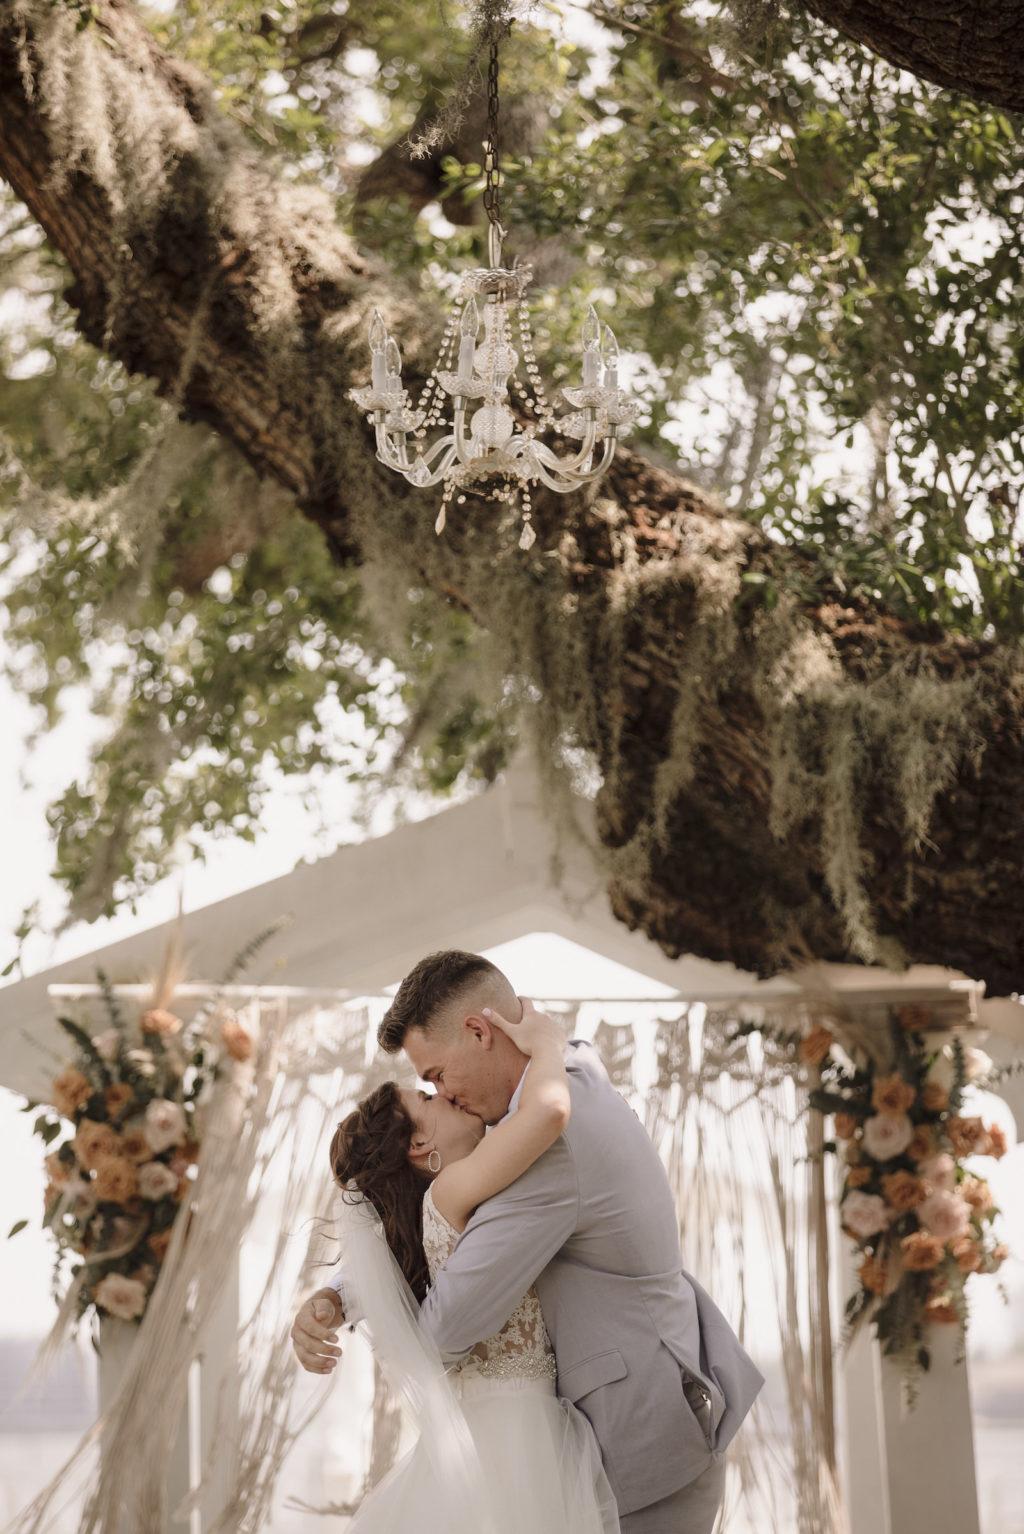 Bride and Groom First Kiss at Bohemian Wedding Ceremony   Florida Waterfront Wedding Ceremony   Sarasota Wedding Photographer Alisa Sue Photography